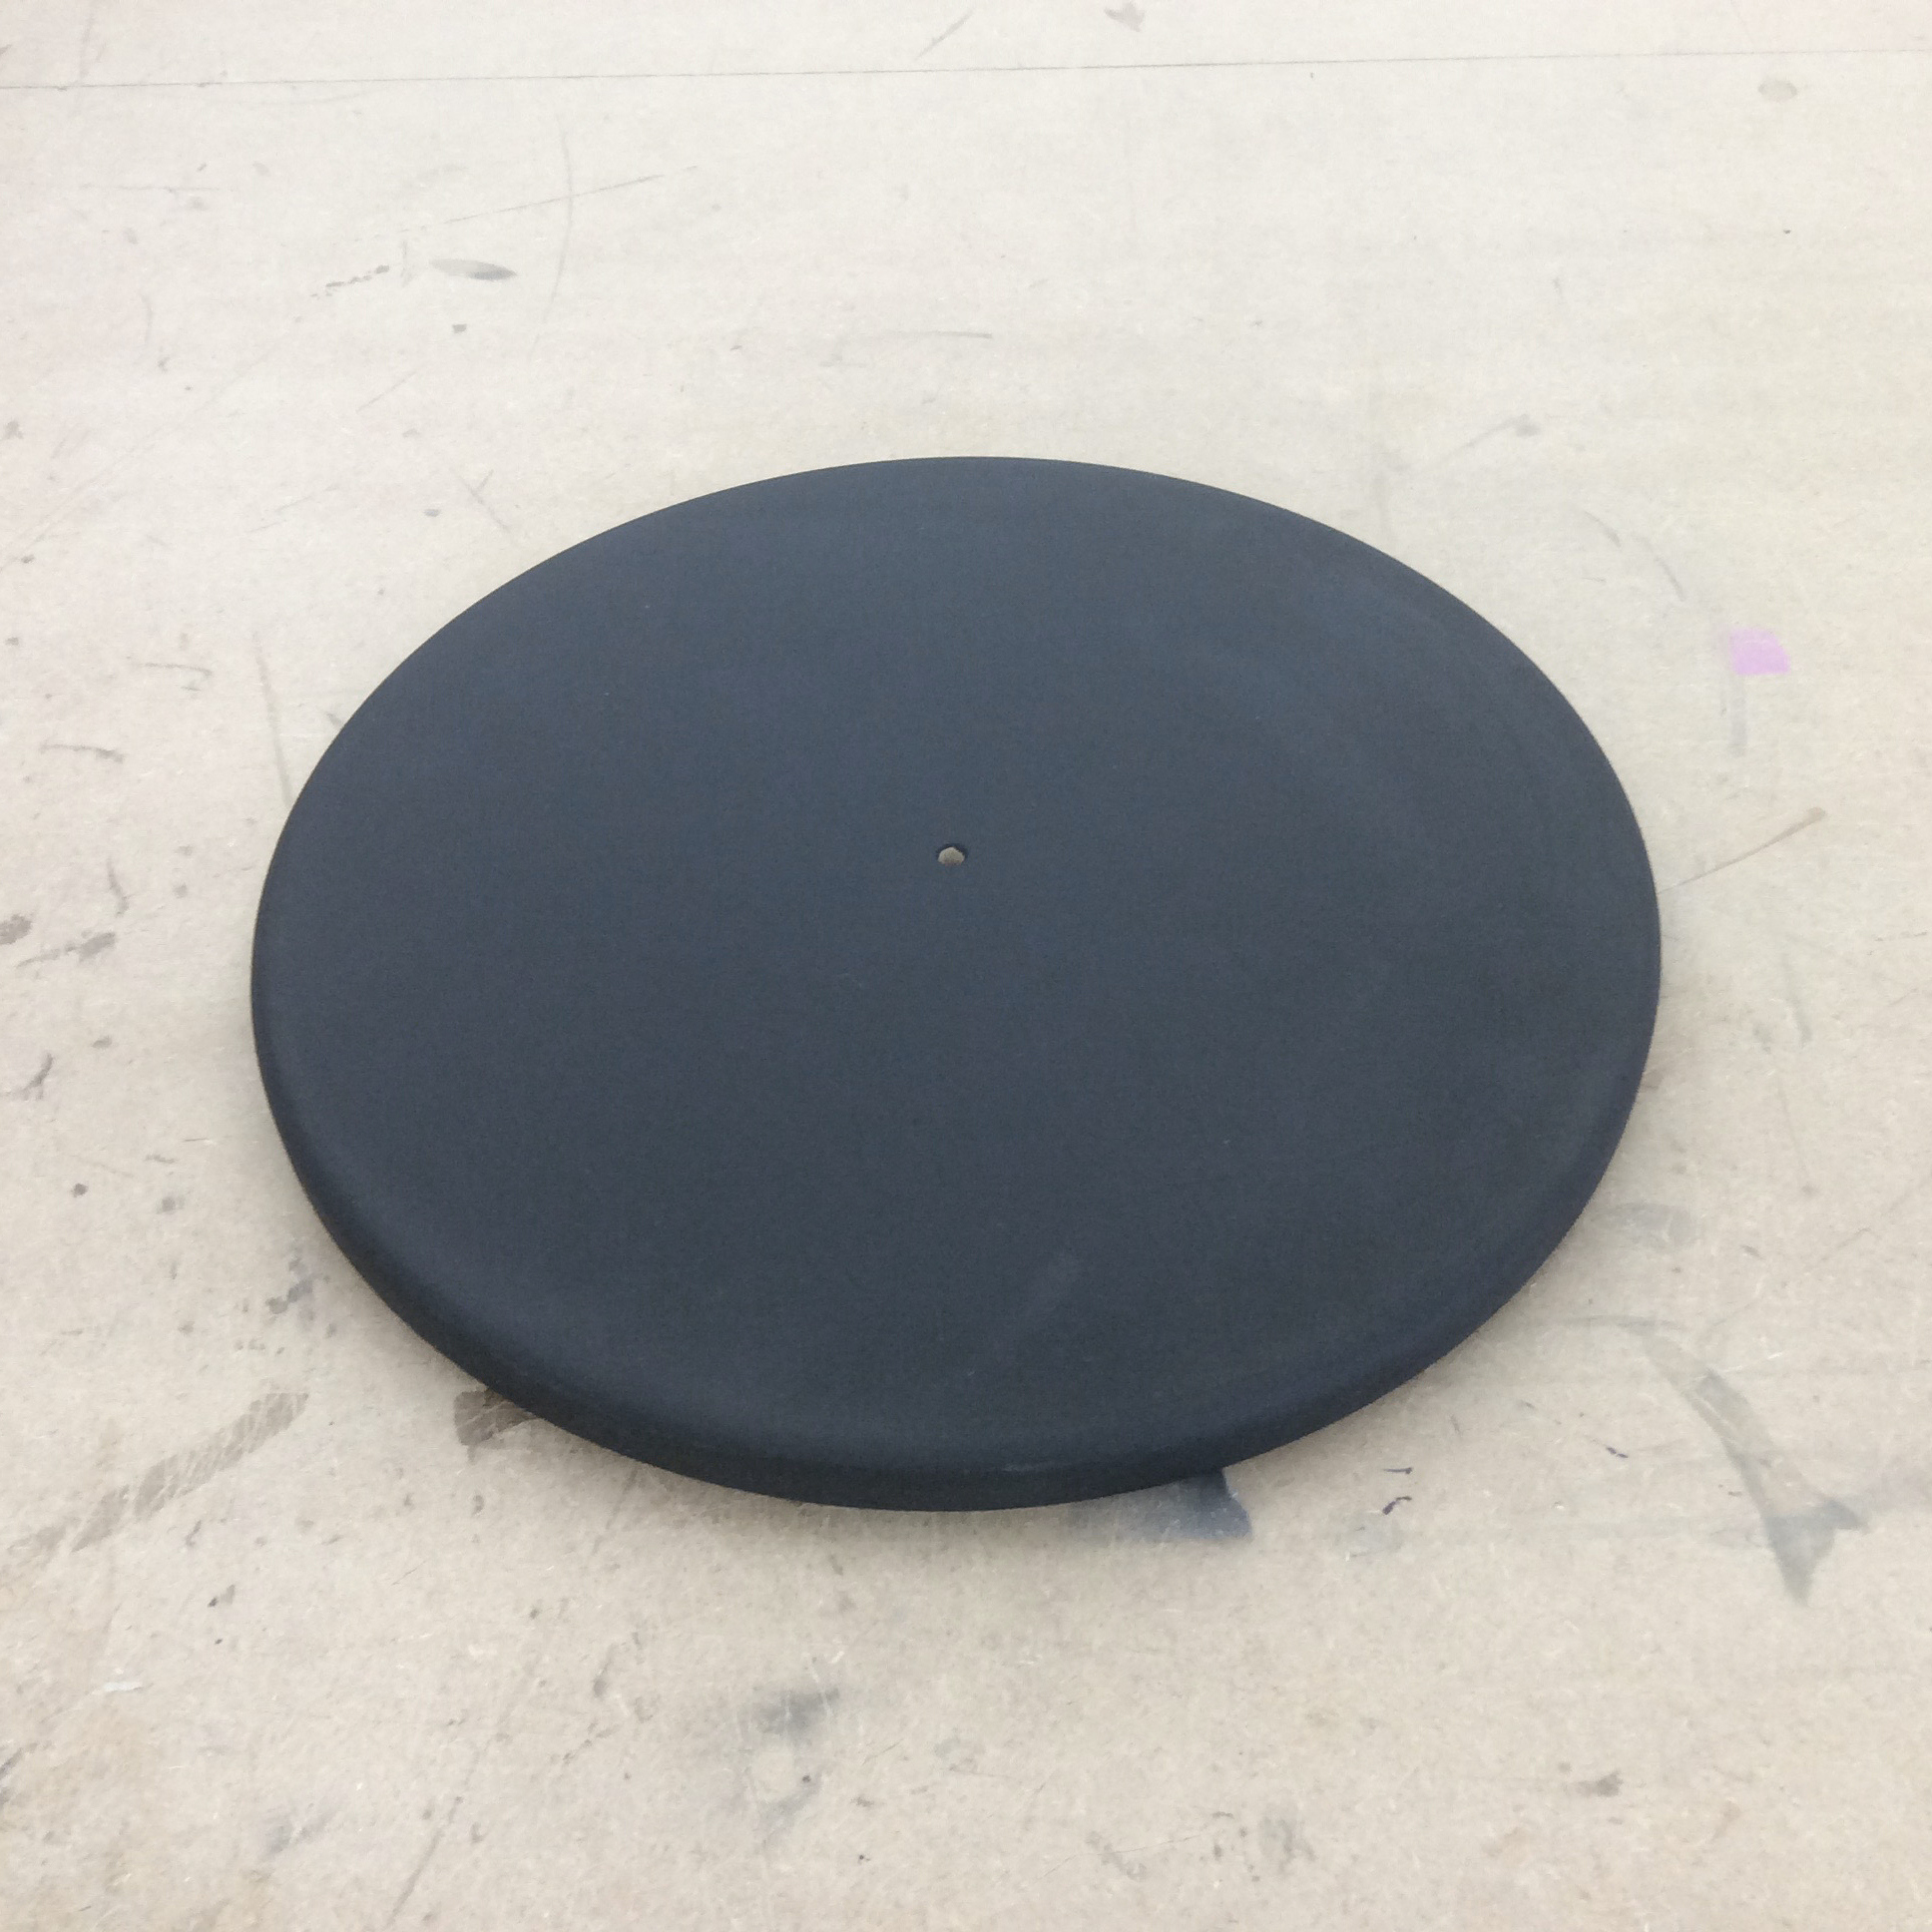 Lid & Scraaaatch™ Stand Base